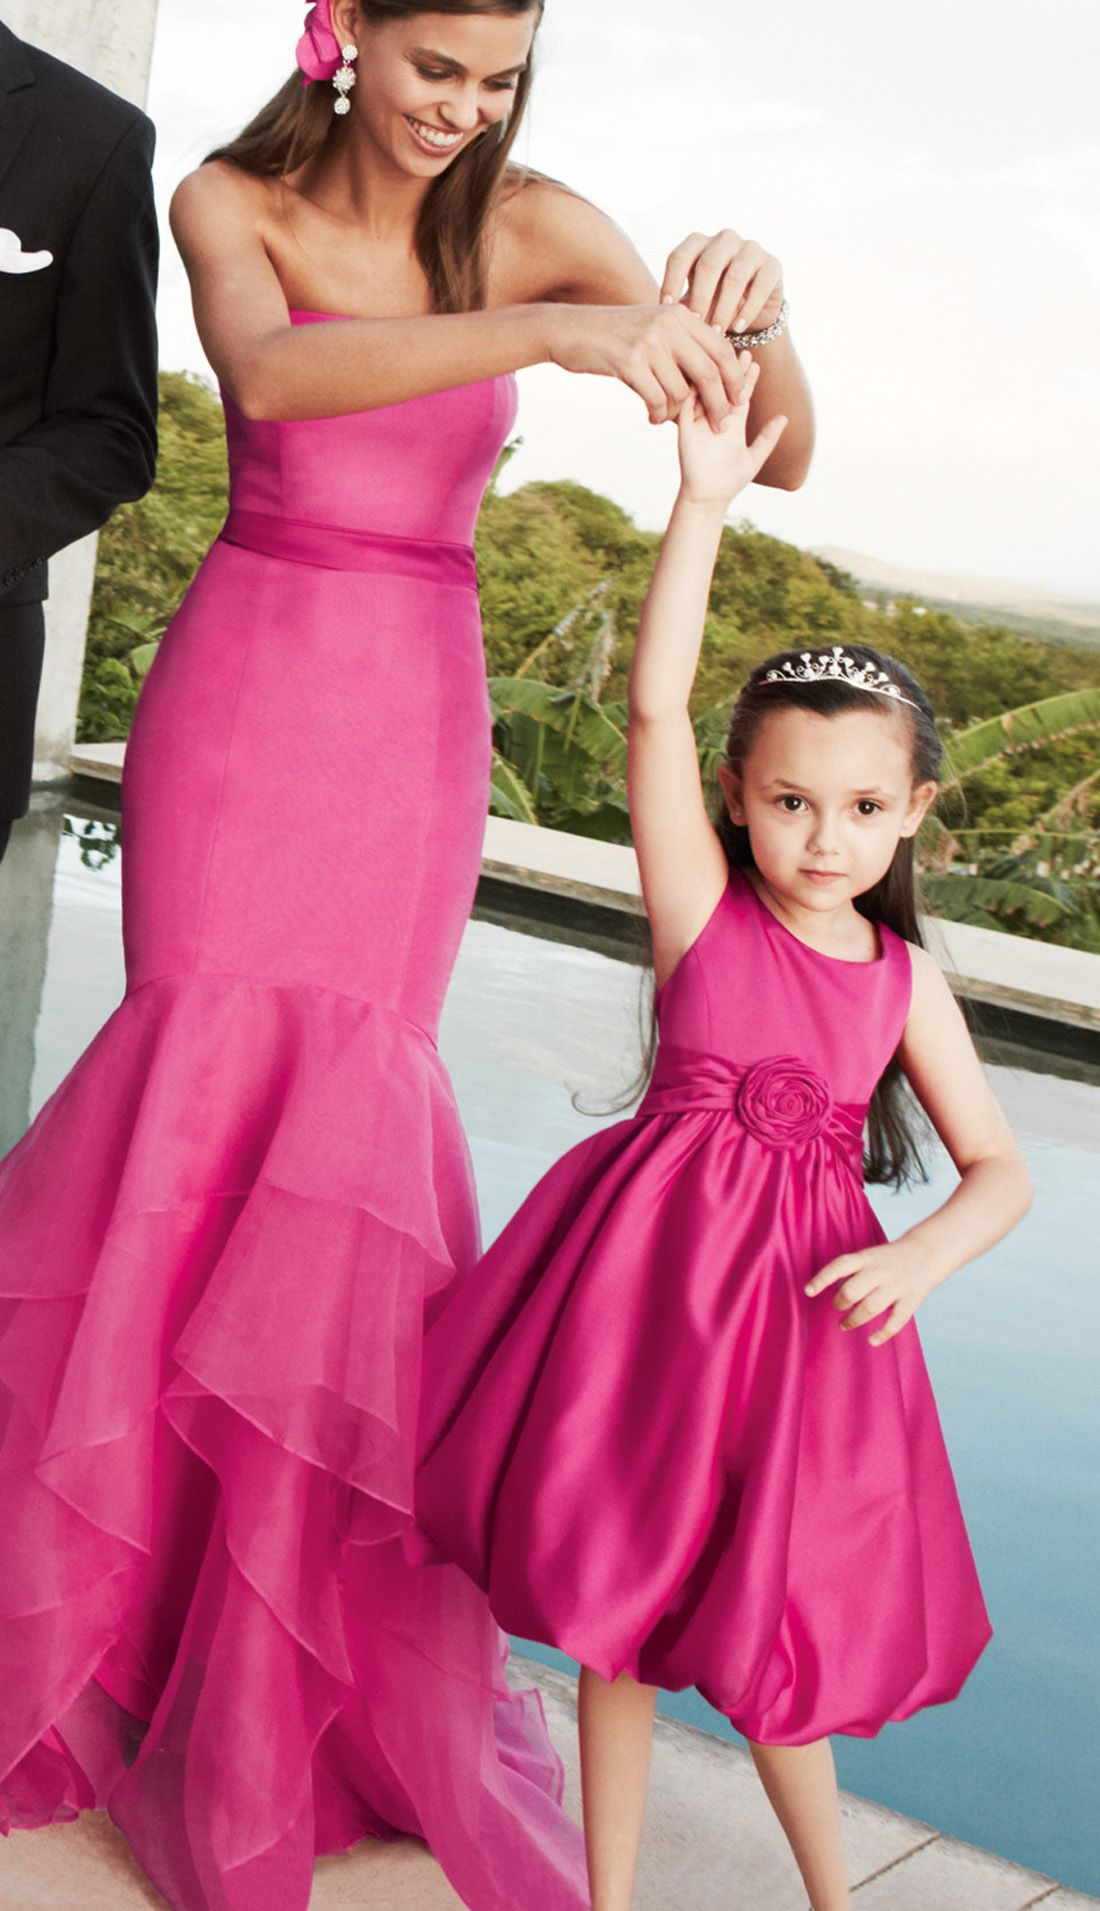 Pin de Carolina Andonii en Like mother like daughter | Pinterest ...